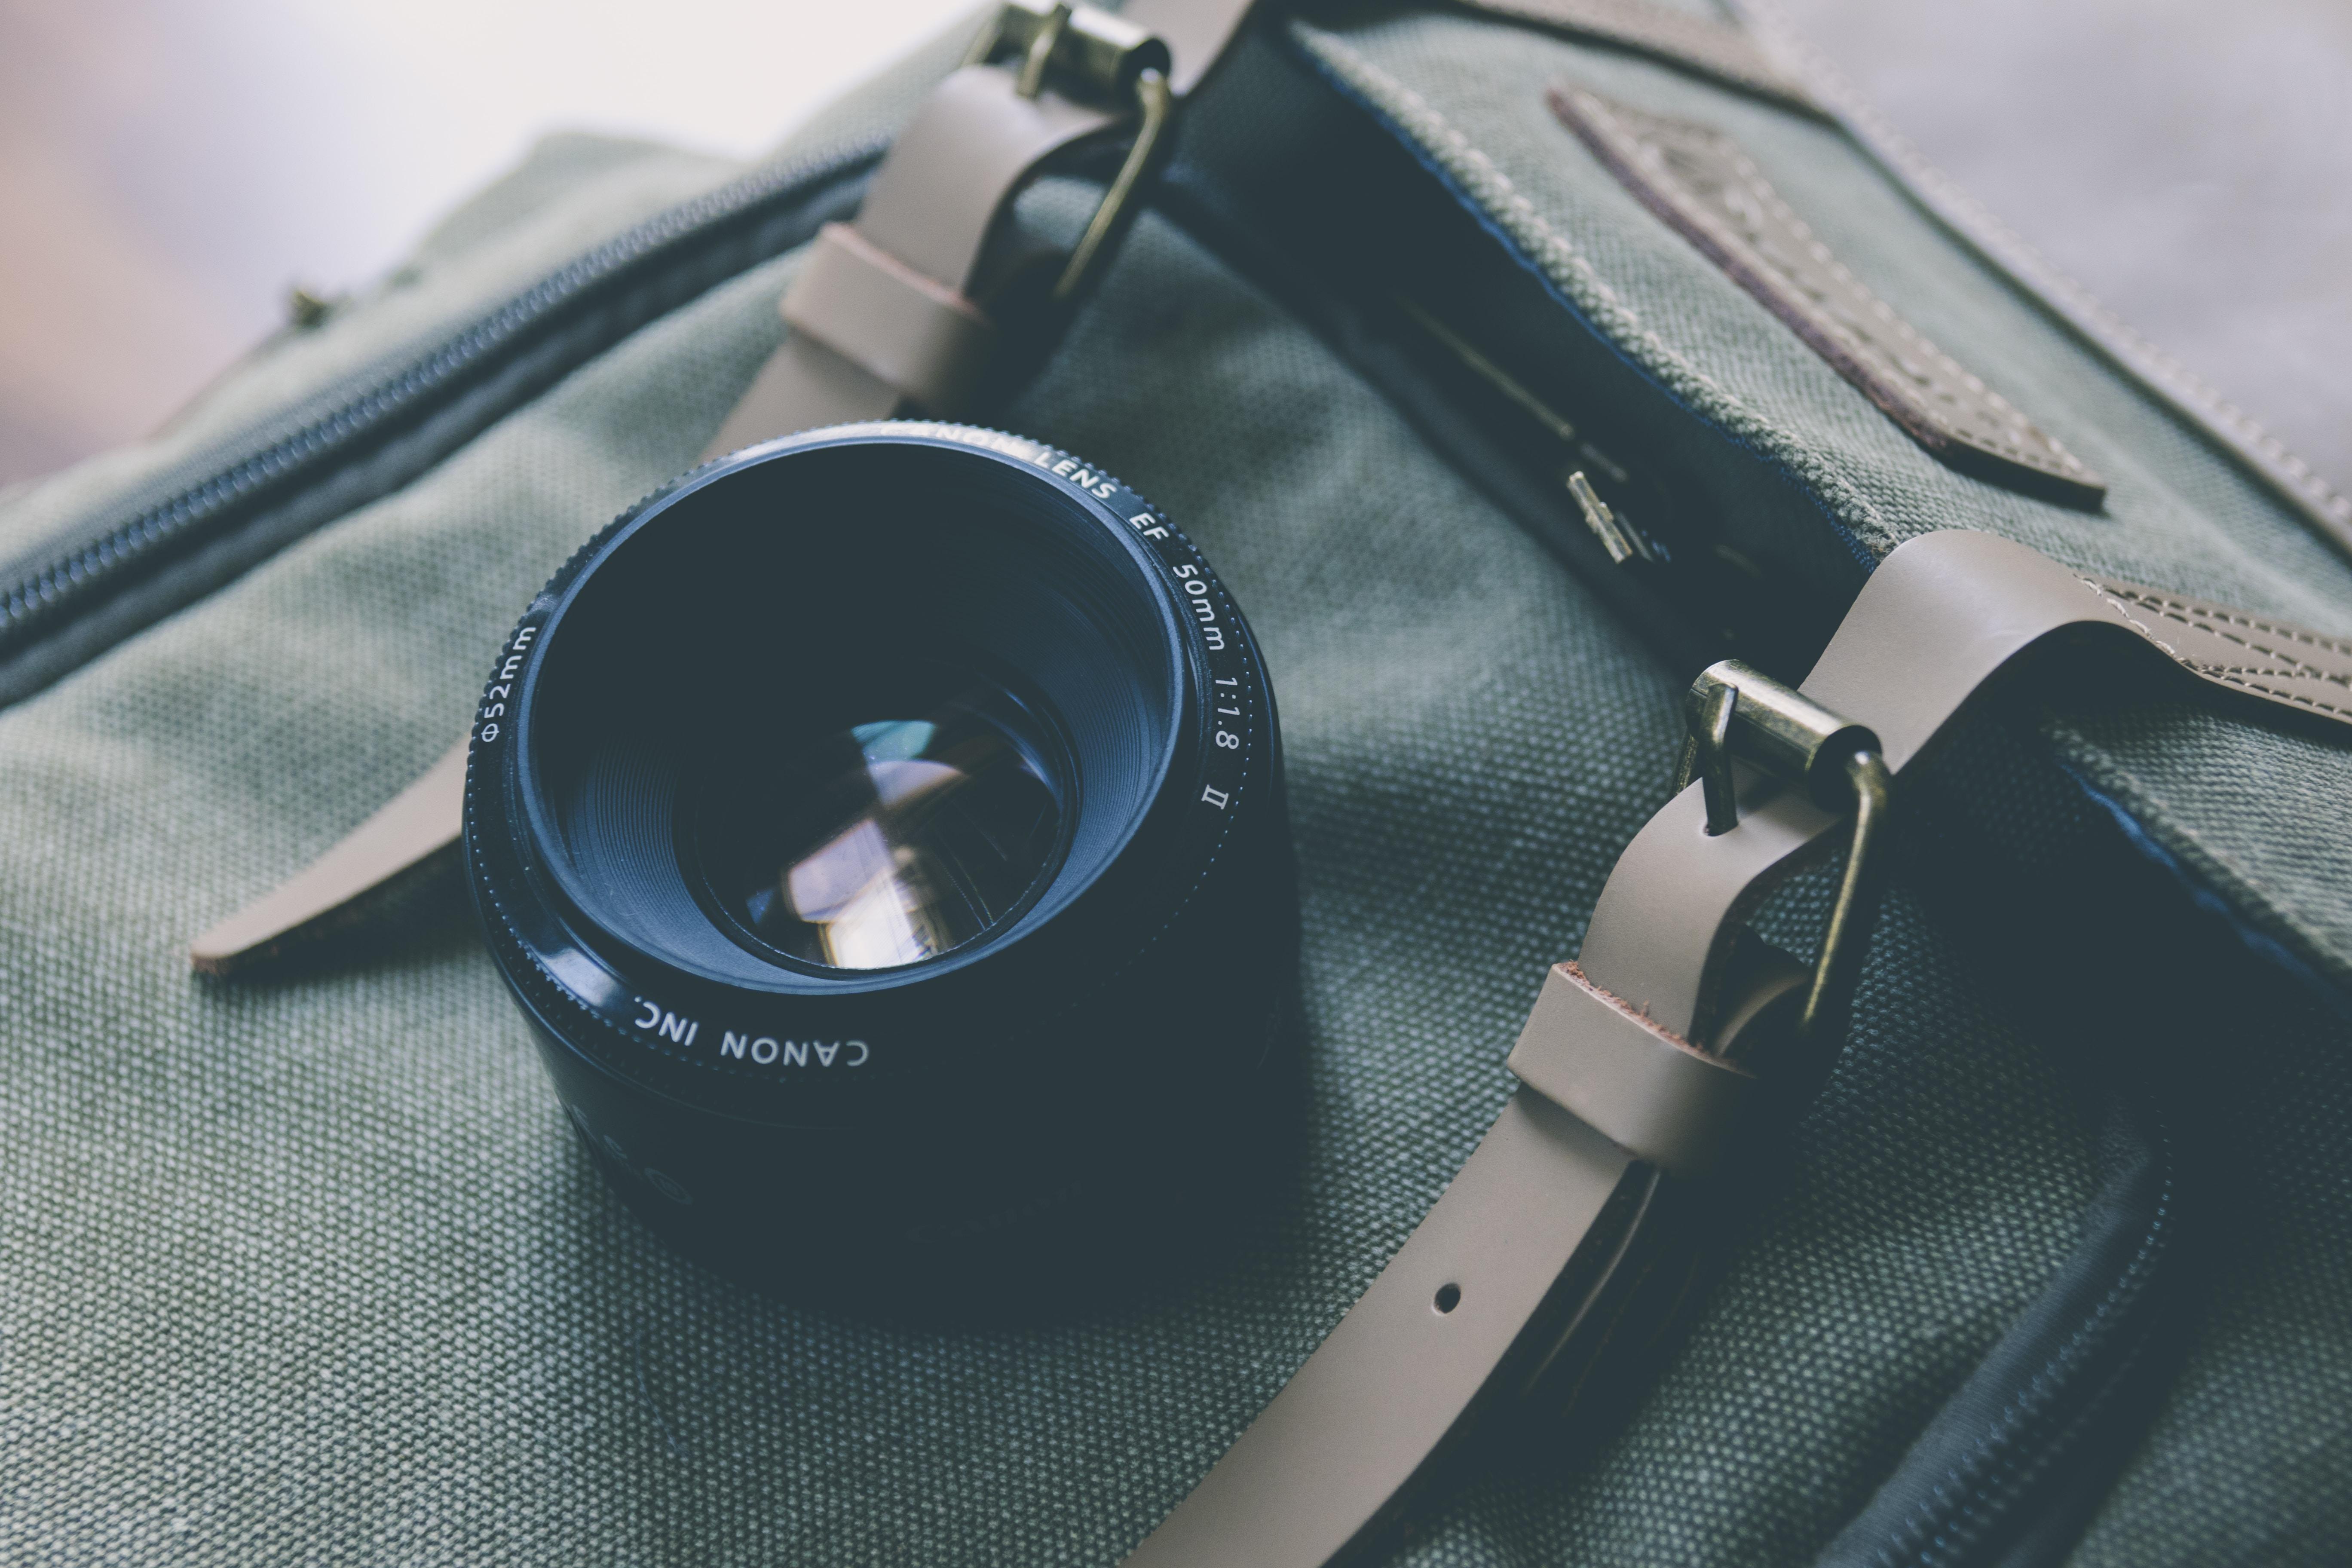 black camera lens on gray bag